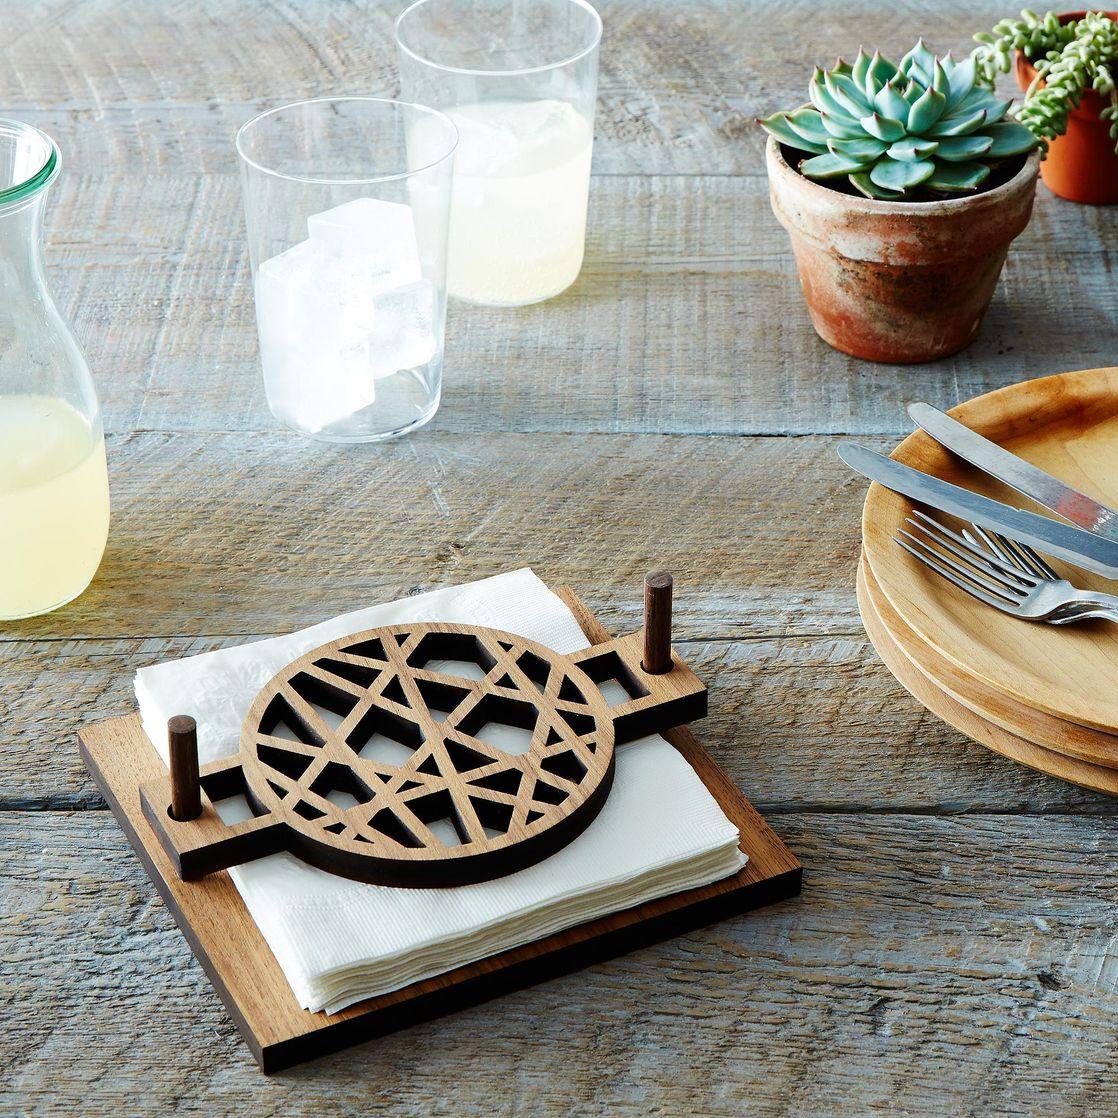 midcentury modern napkin holder on food - midcentury modern napkin holder